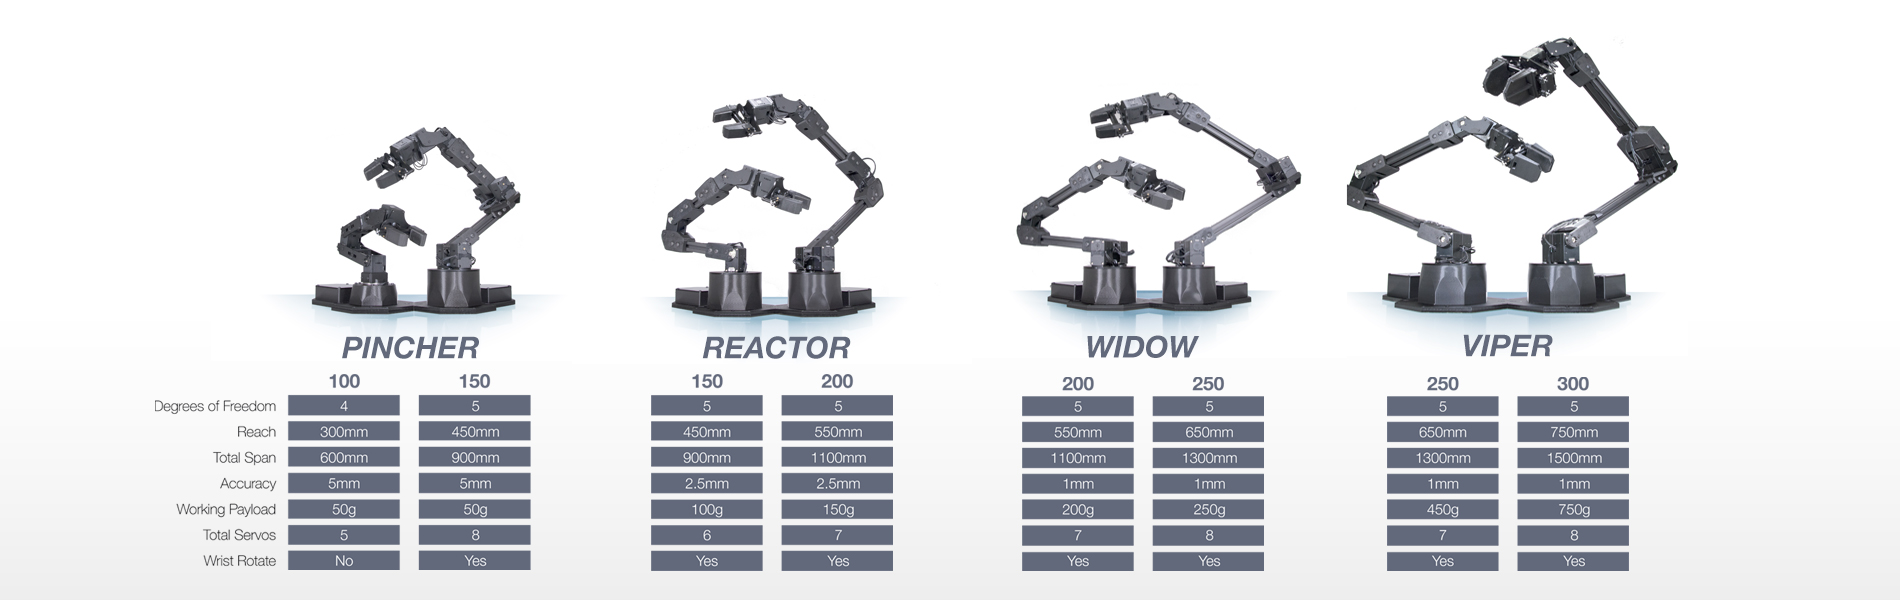 Interbotix X-Series Robot Arms